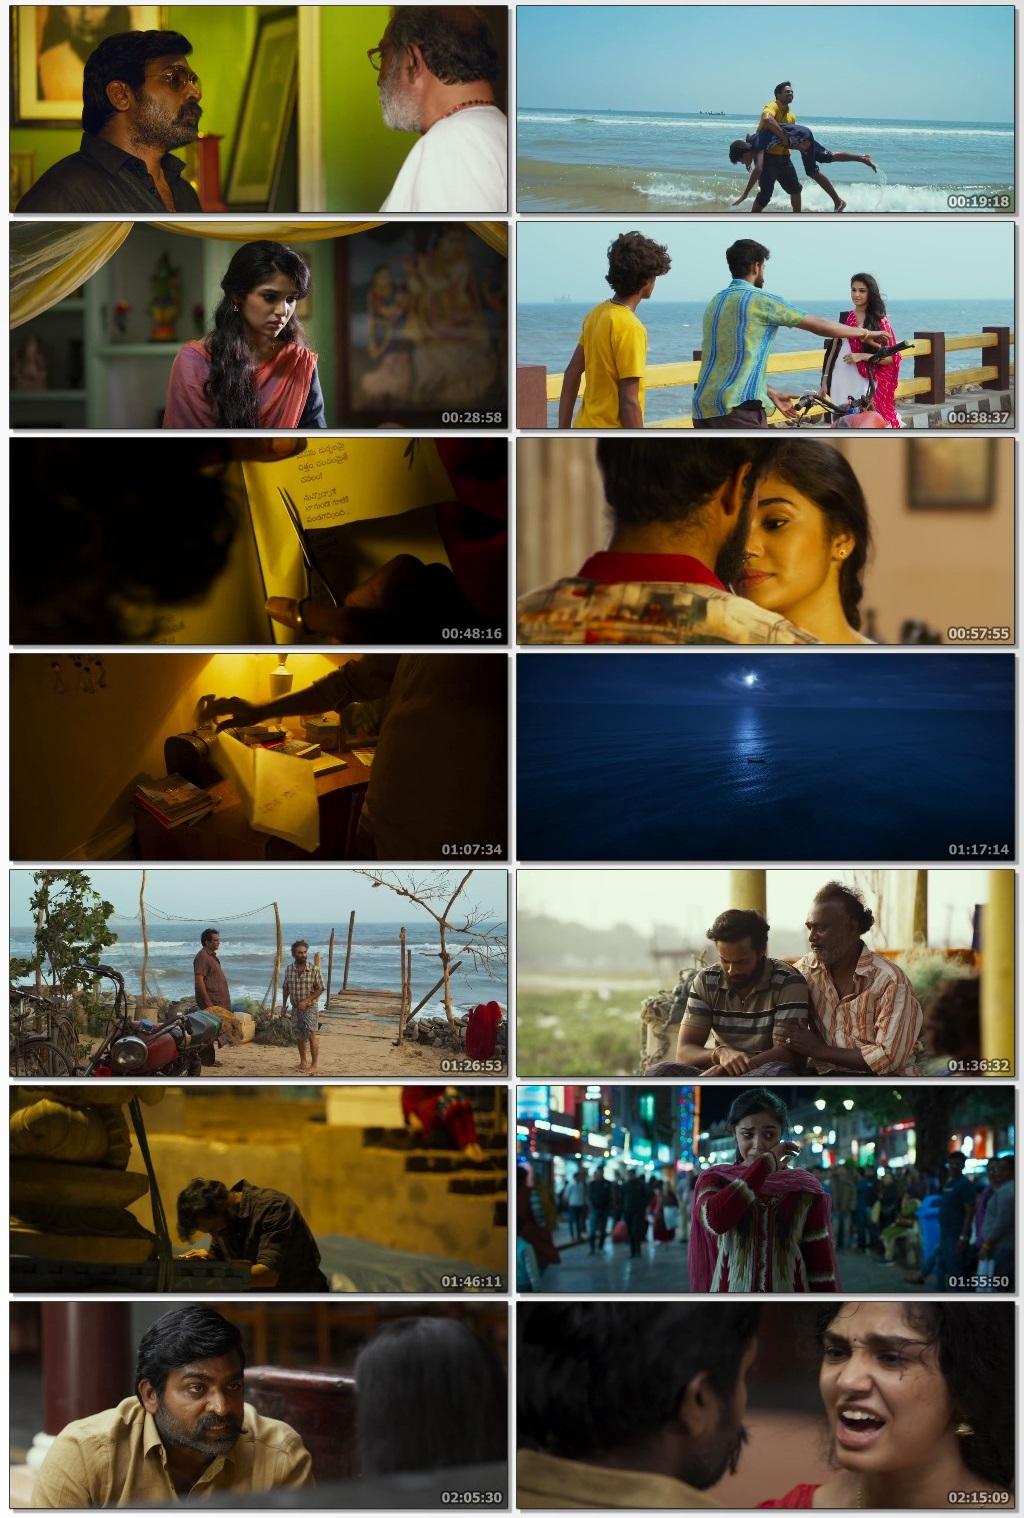 Uppena-2021-www-9kmovies-cool-Telugu-1080p-HDRip-ESub-1-3-GB-mkv-thumbs